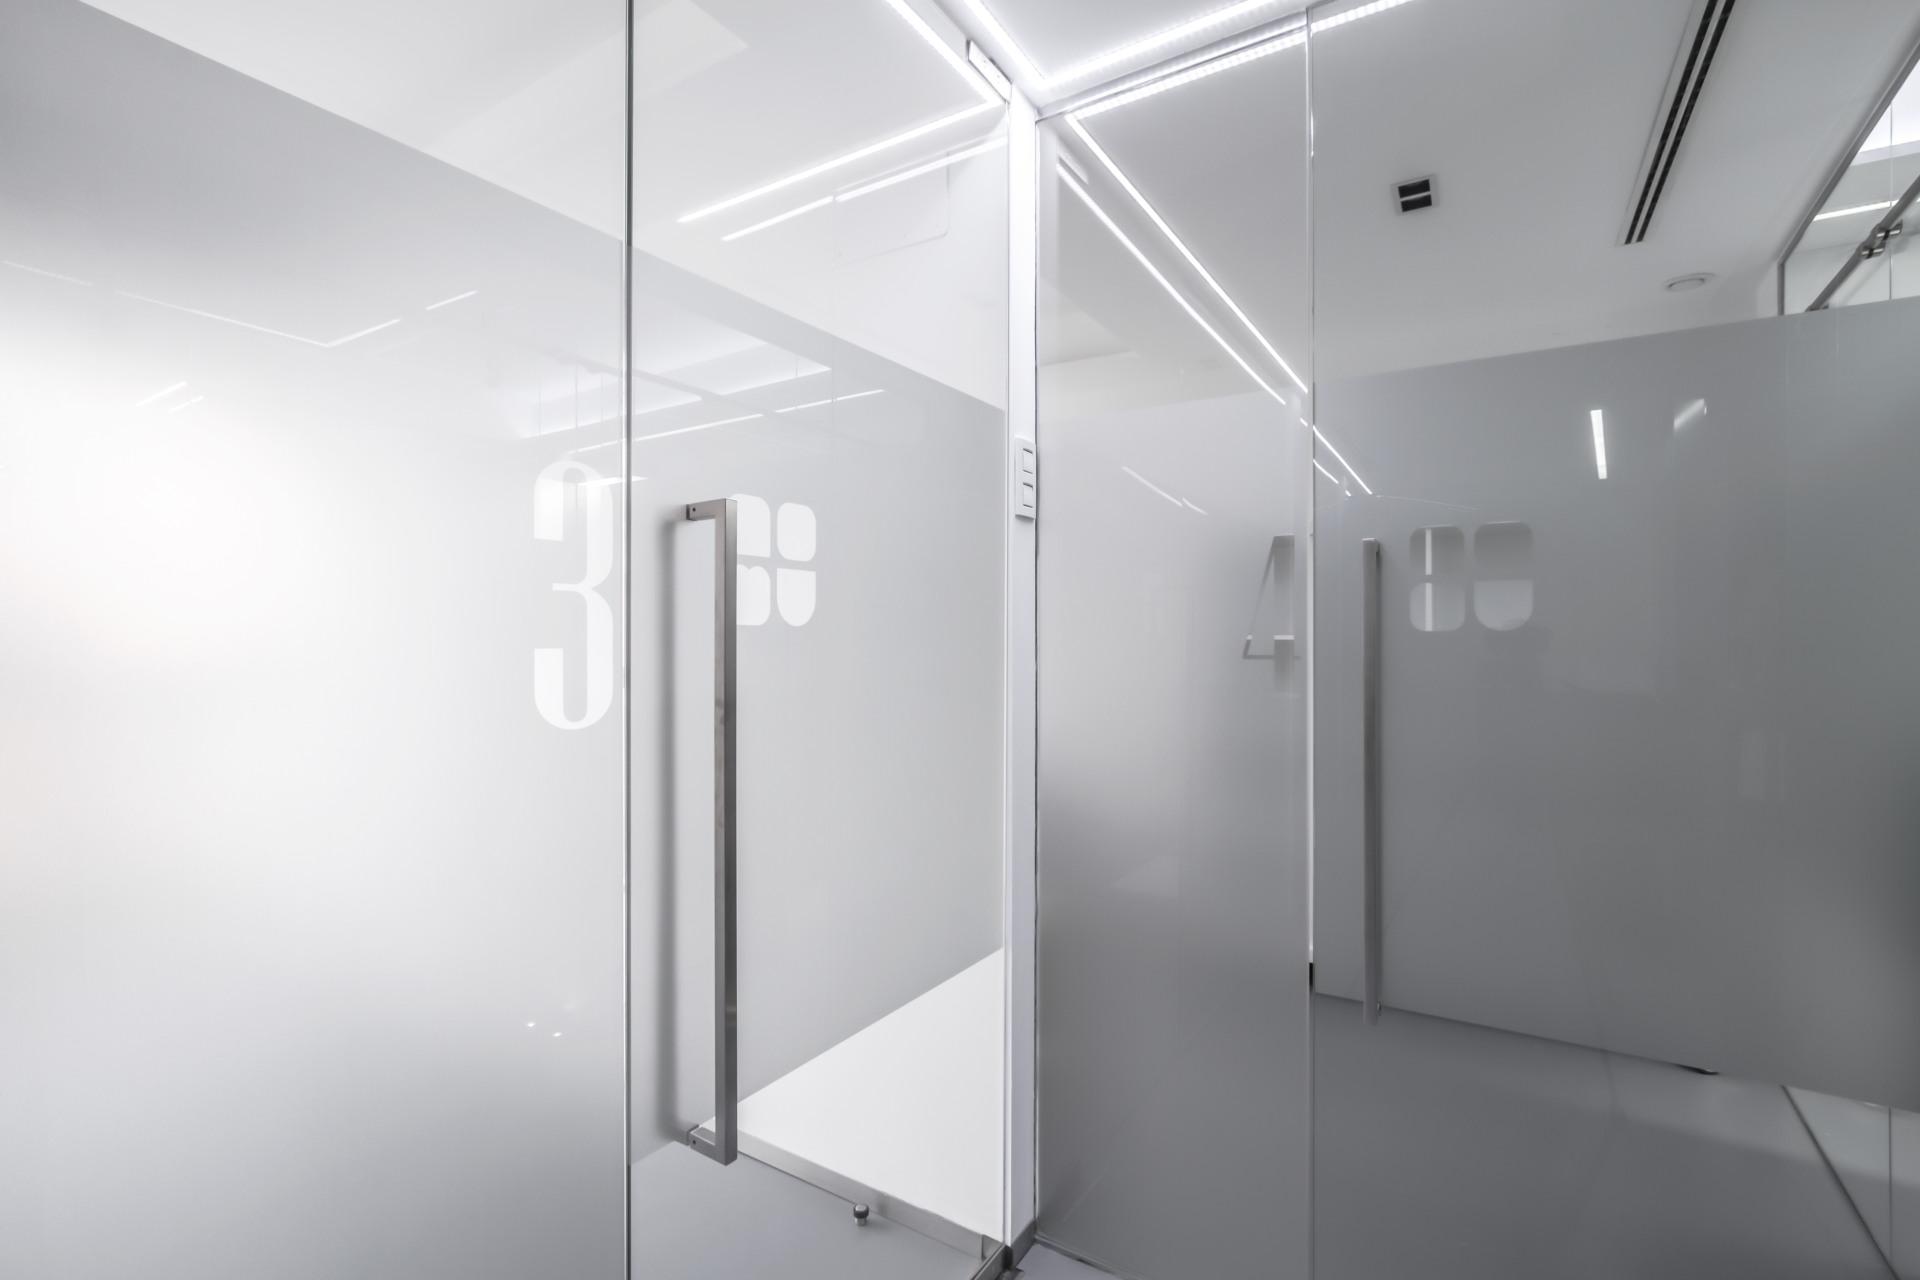 fotografia-arquitectura-valencia-german-cabo-hernandez-clinica (11)